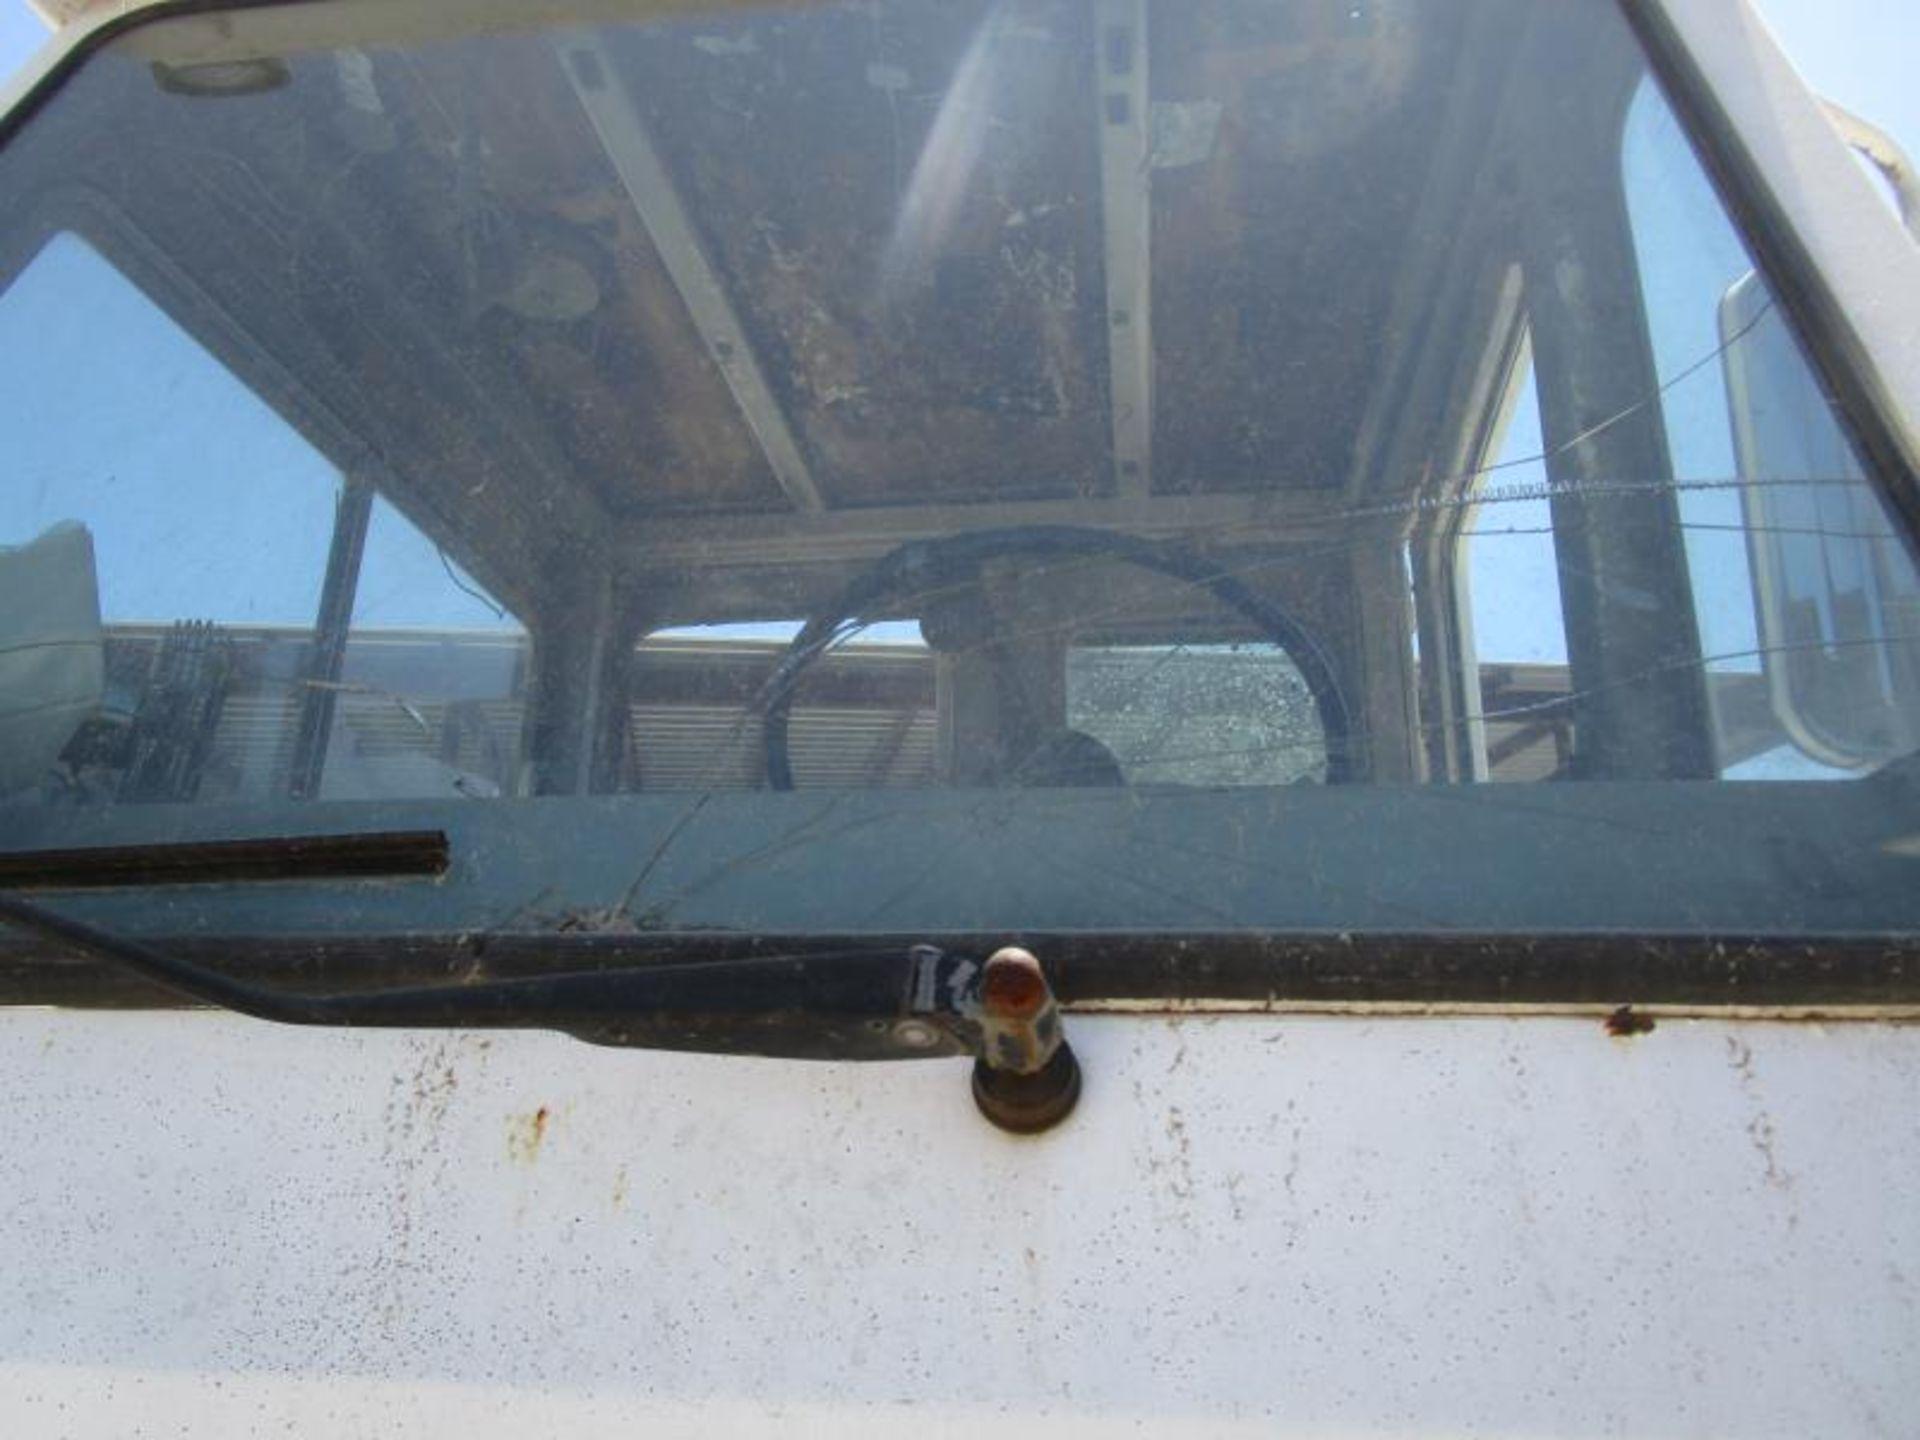 Yard truck by Ottawa truck model# 30 SN: 65044390 engine hours 8,164 - Image 3 of 8